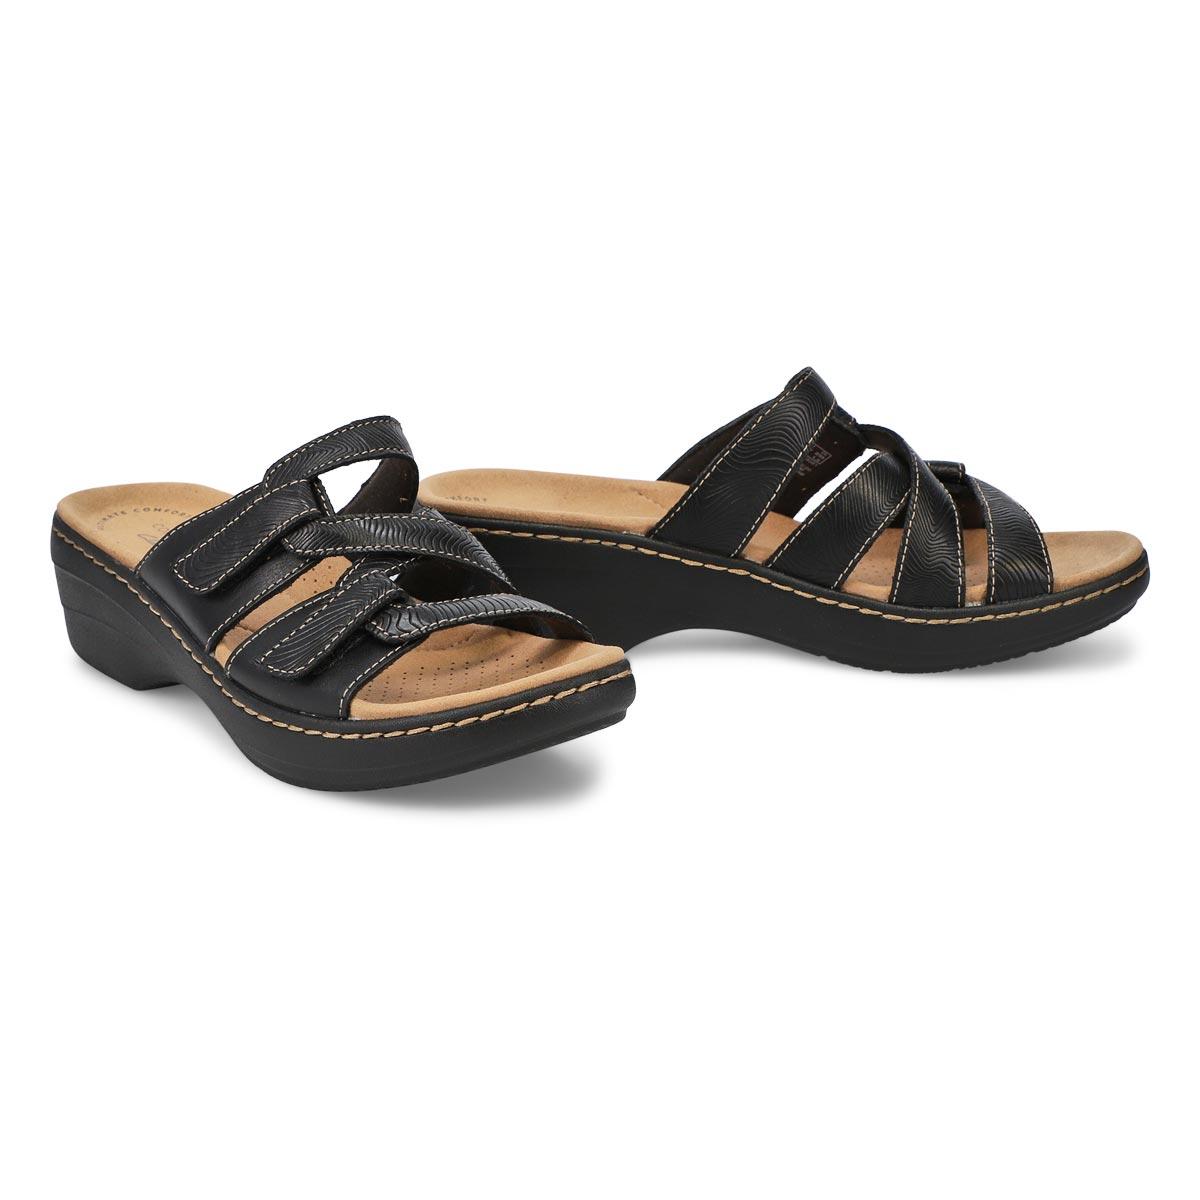 Womens' Merliah Karli Sandal - Black